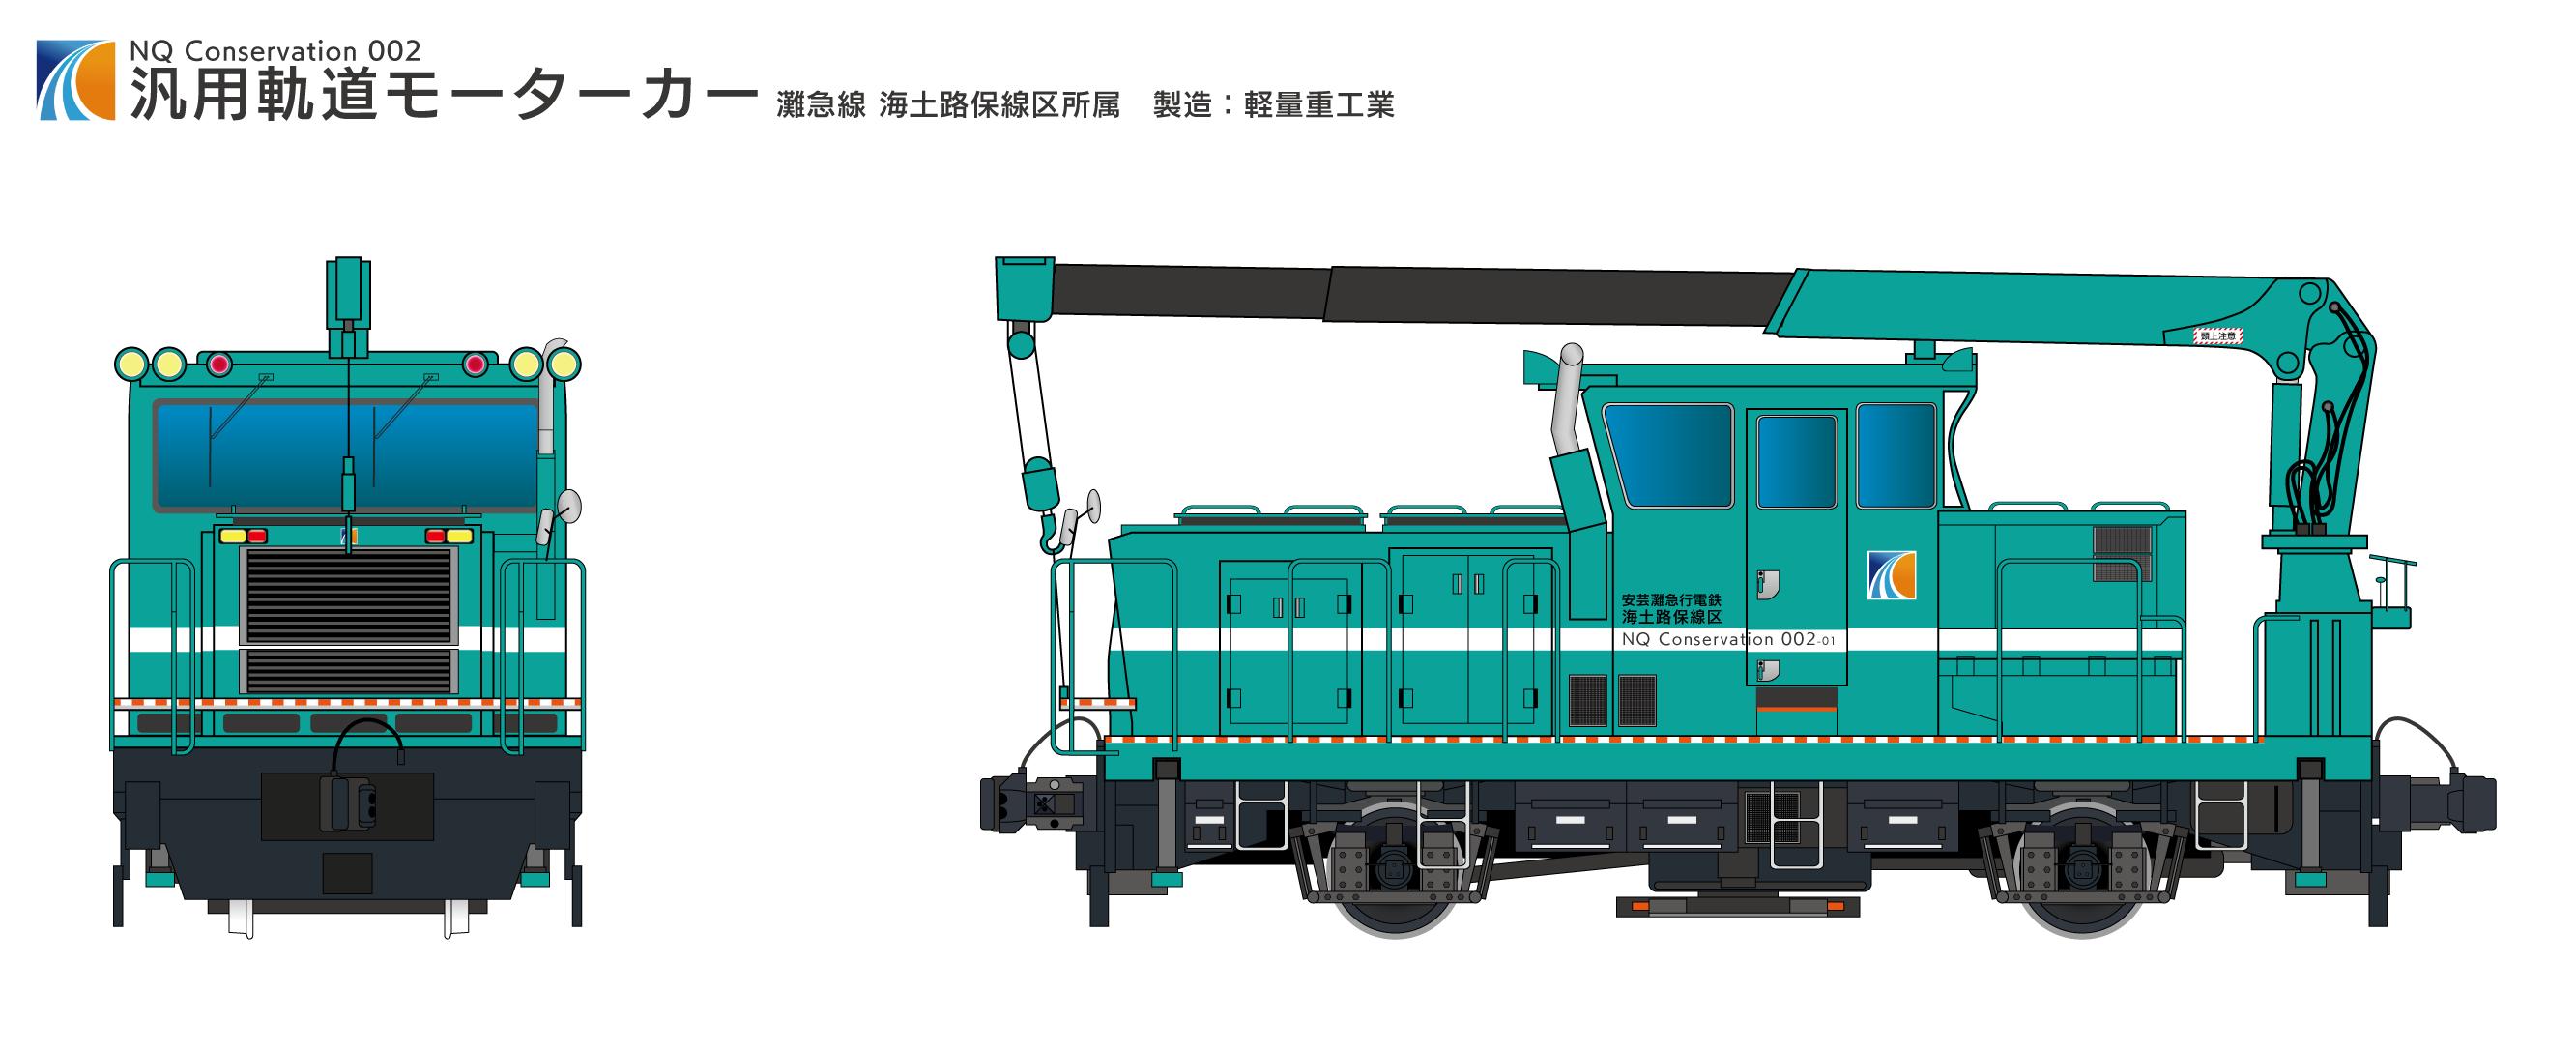 NQC002-01